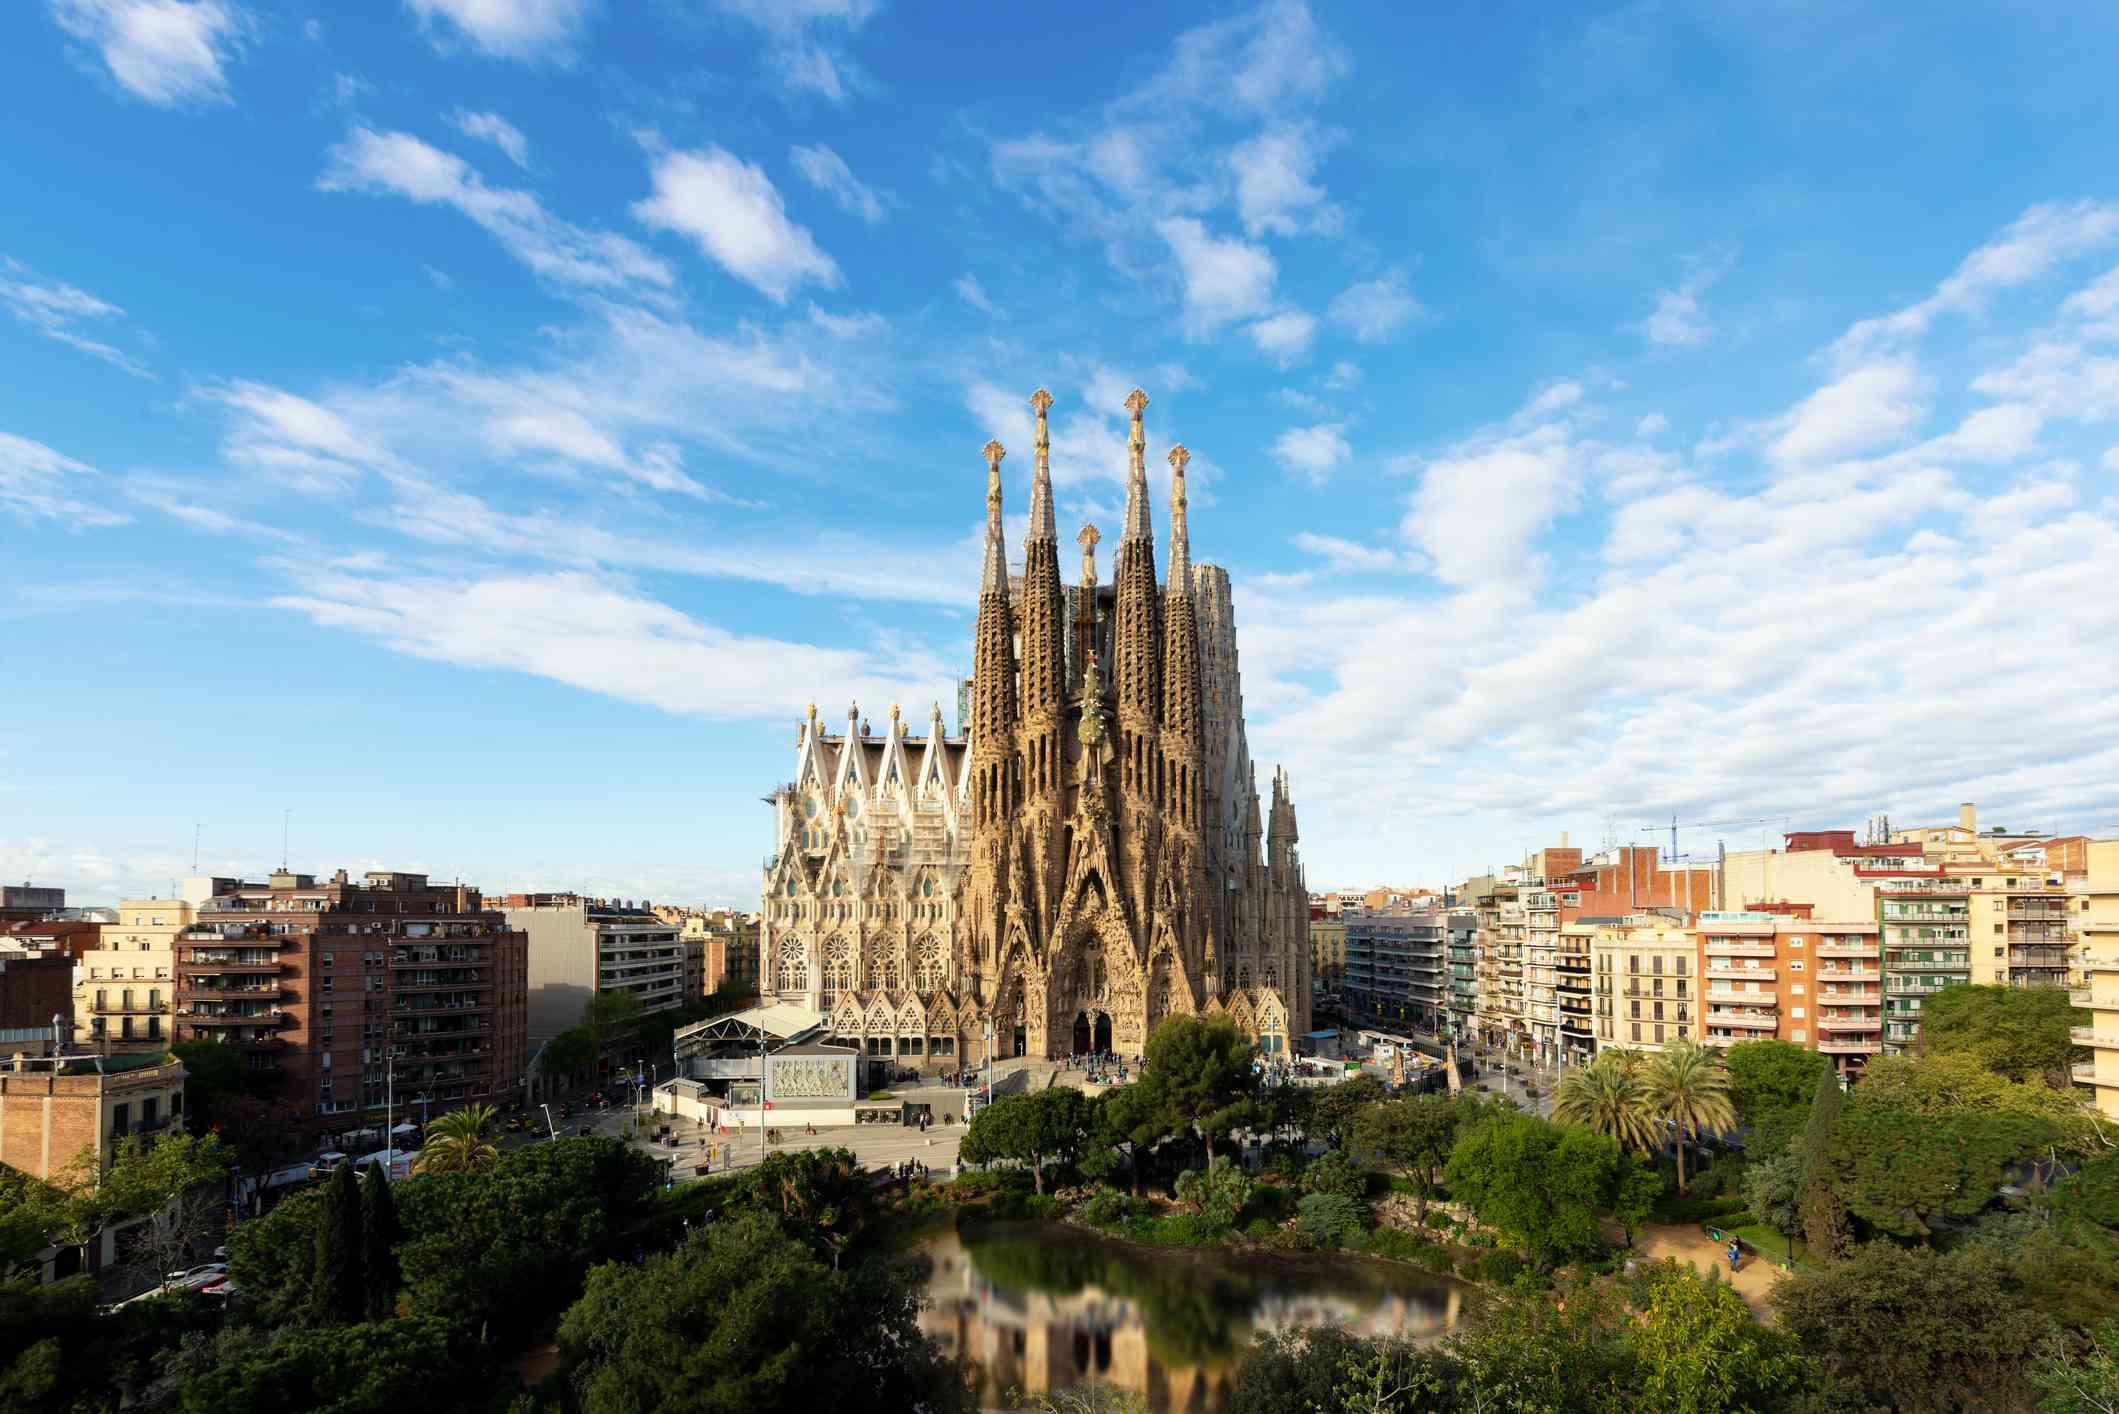 Aerial view of the Sagrada Familia